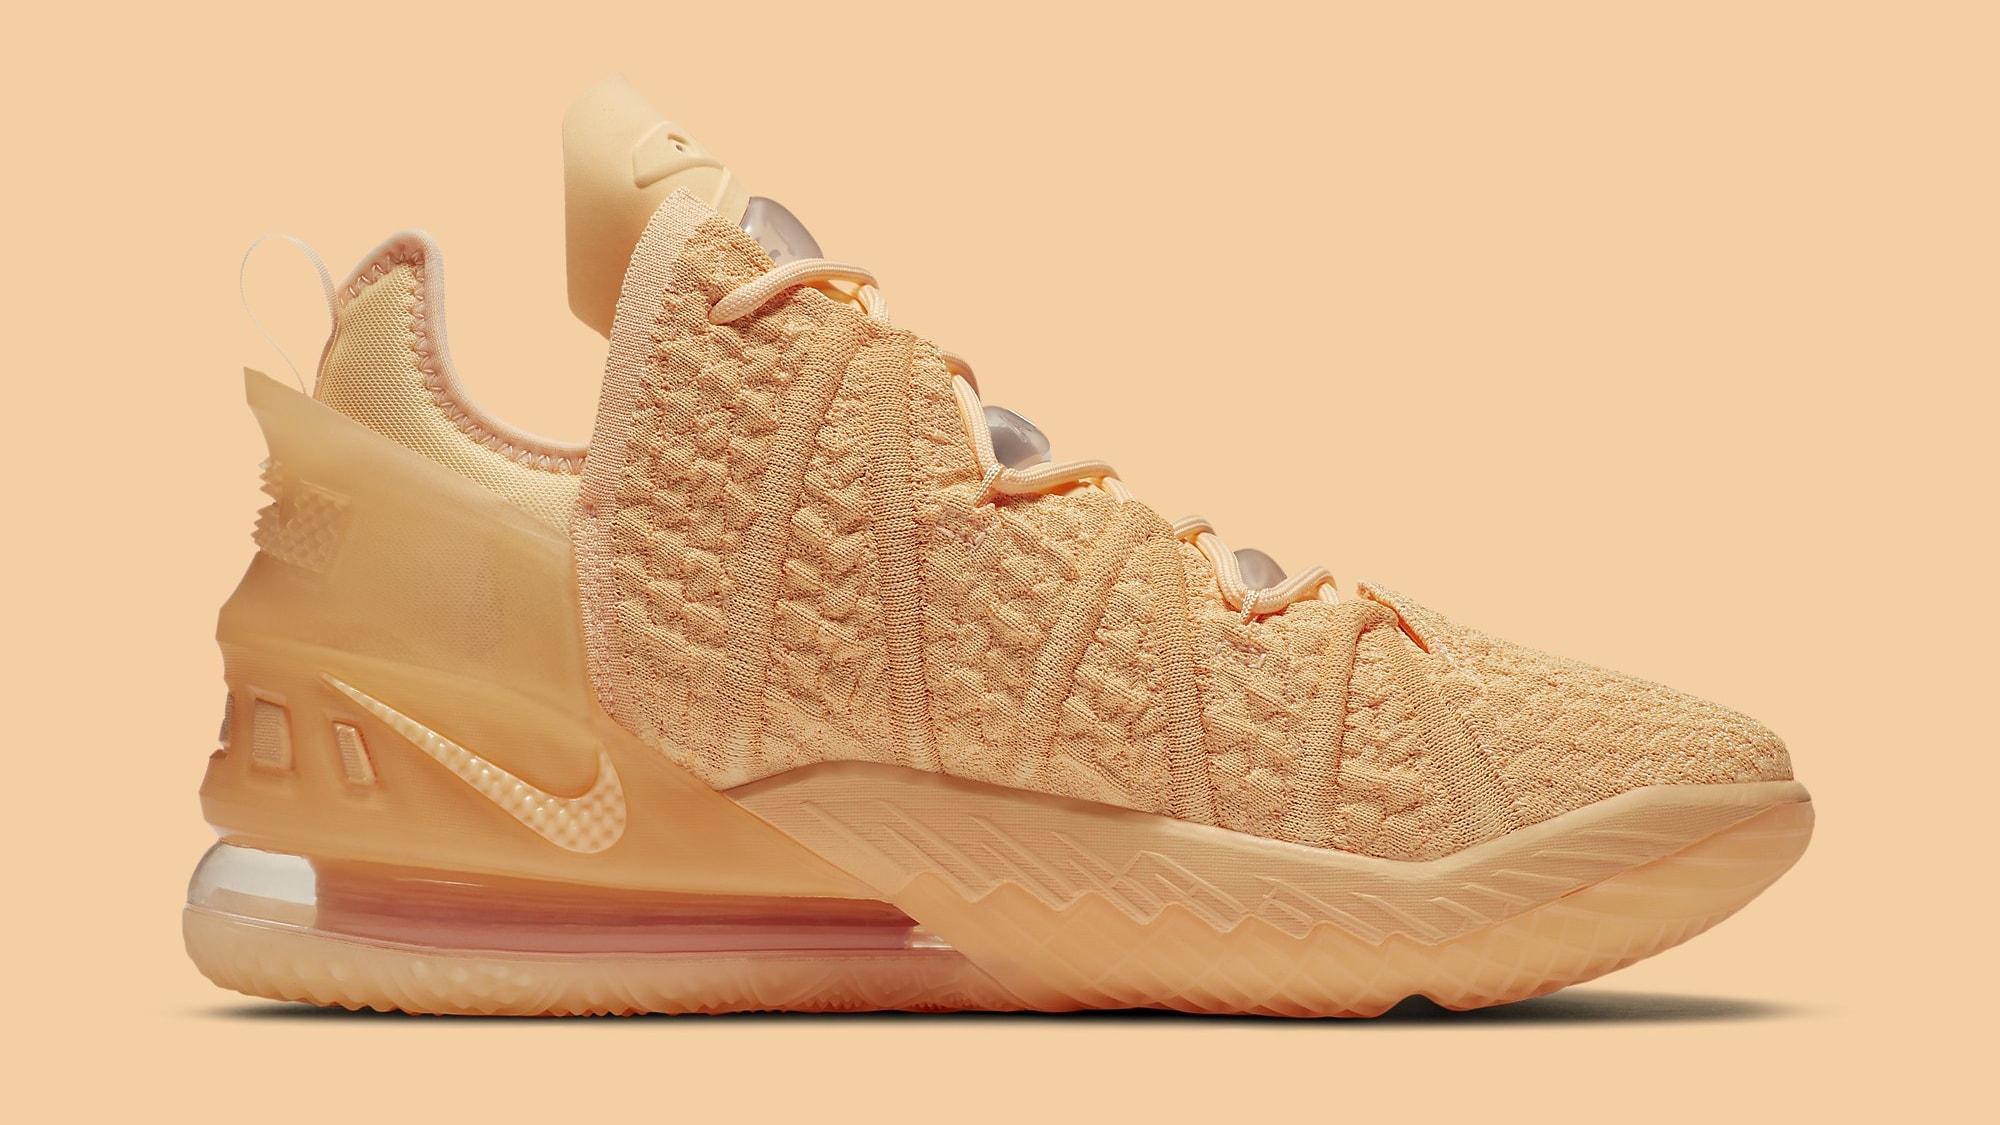 Nike LeBron 18 'Melon Tint' DB8148-801 Medial